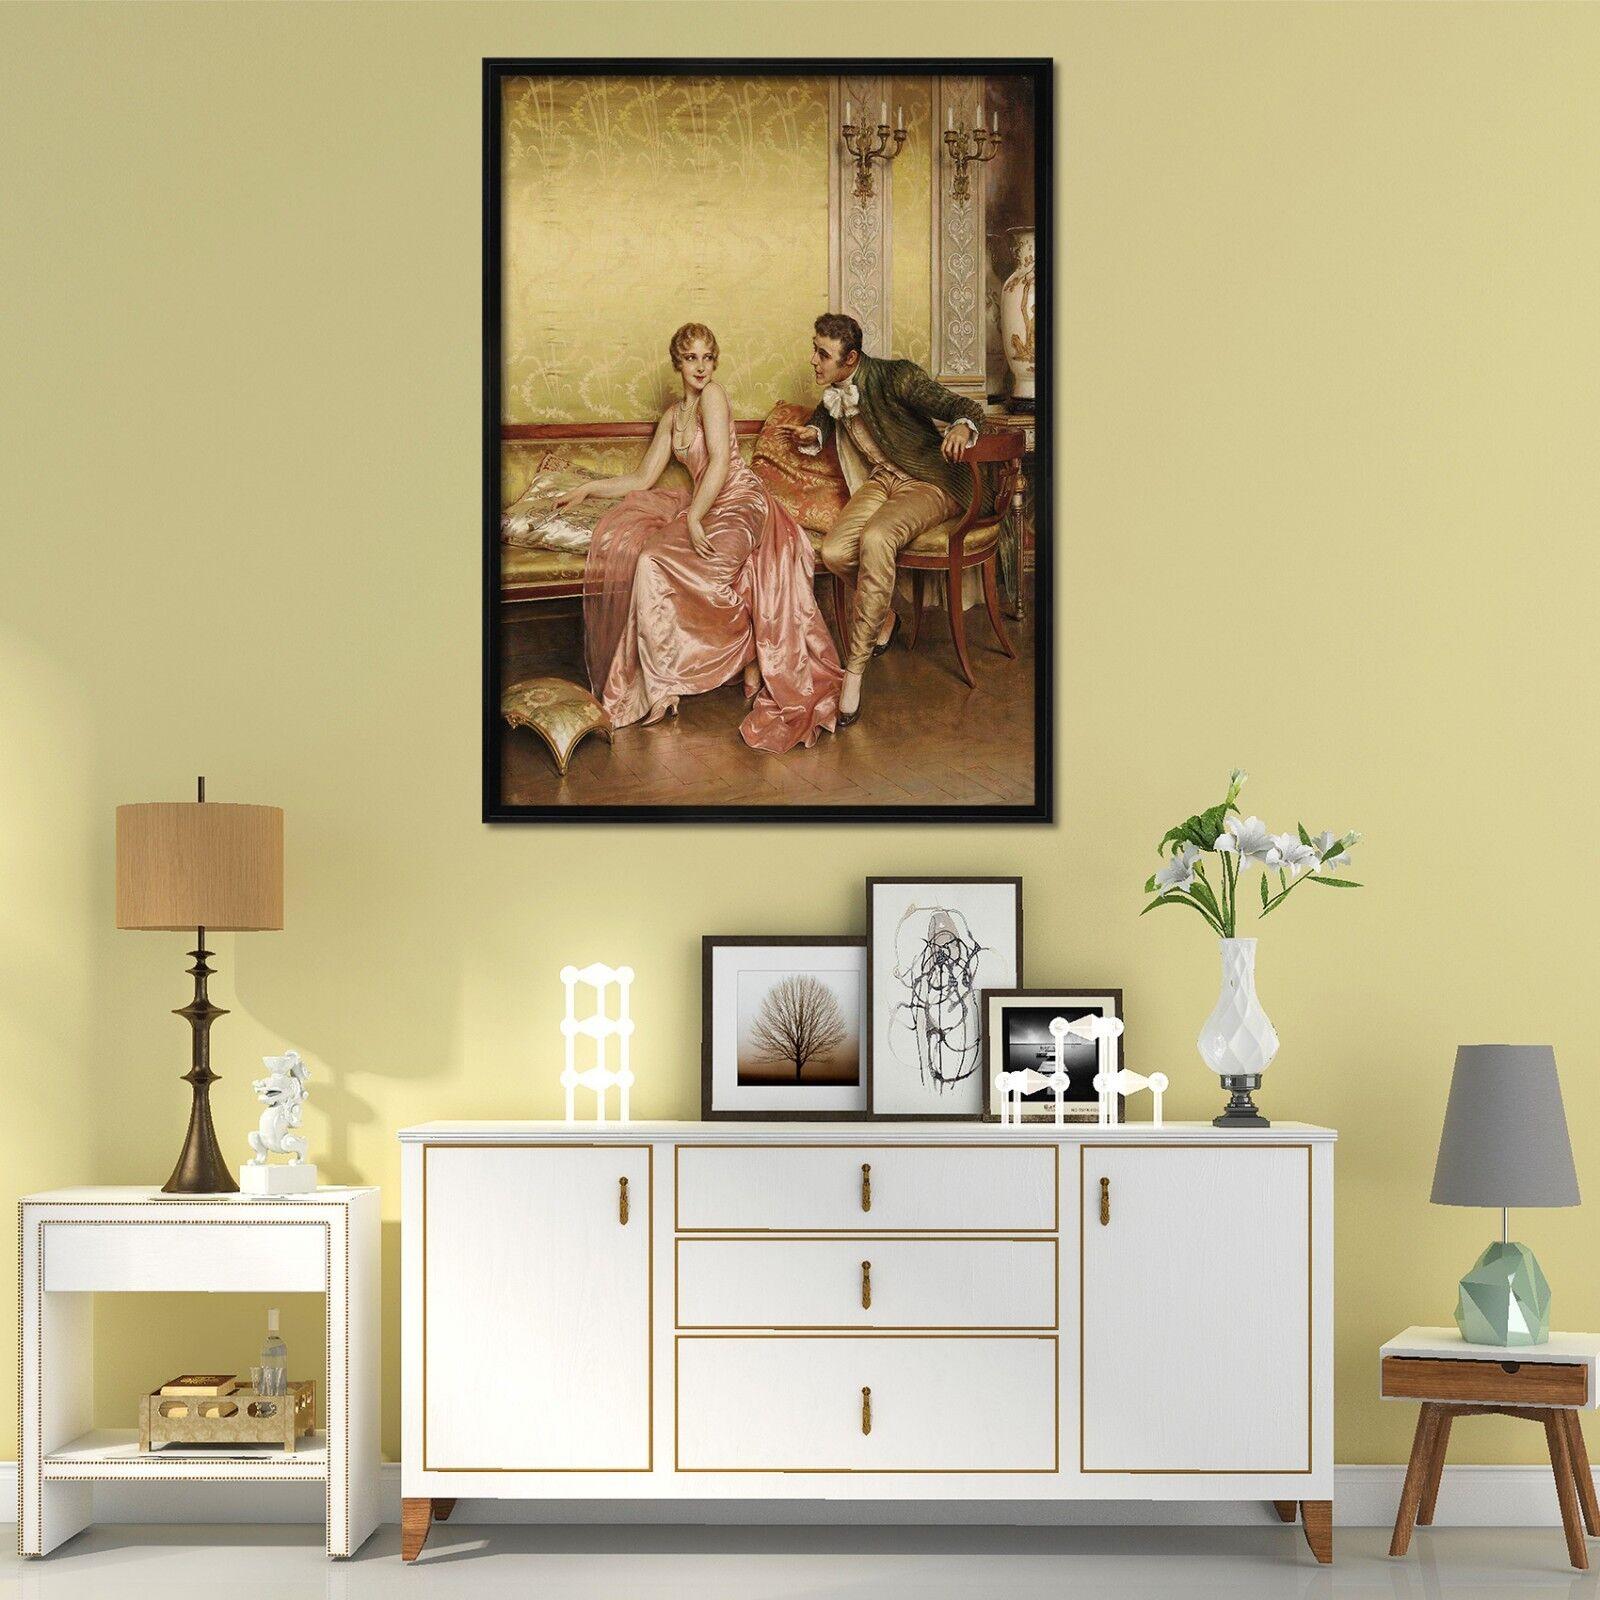 3D Europe Noble Painting 3 Framed Poster Home Decor Print Painting Art WALLPAPER